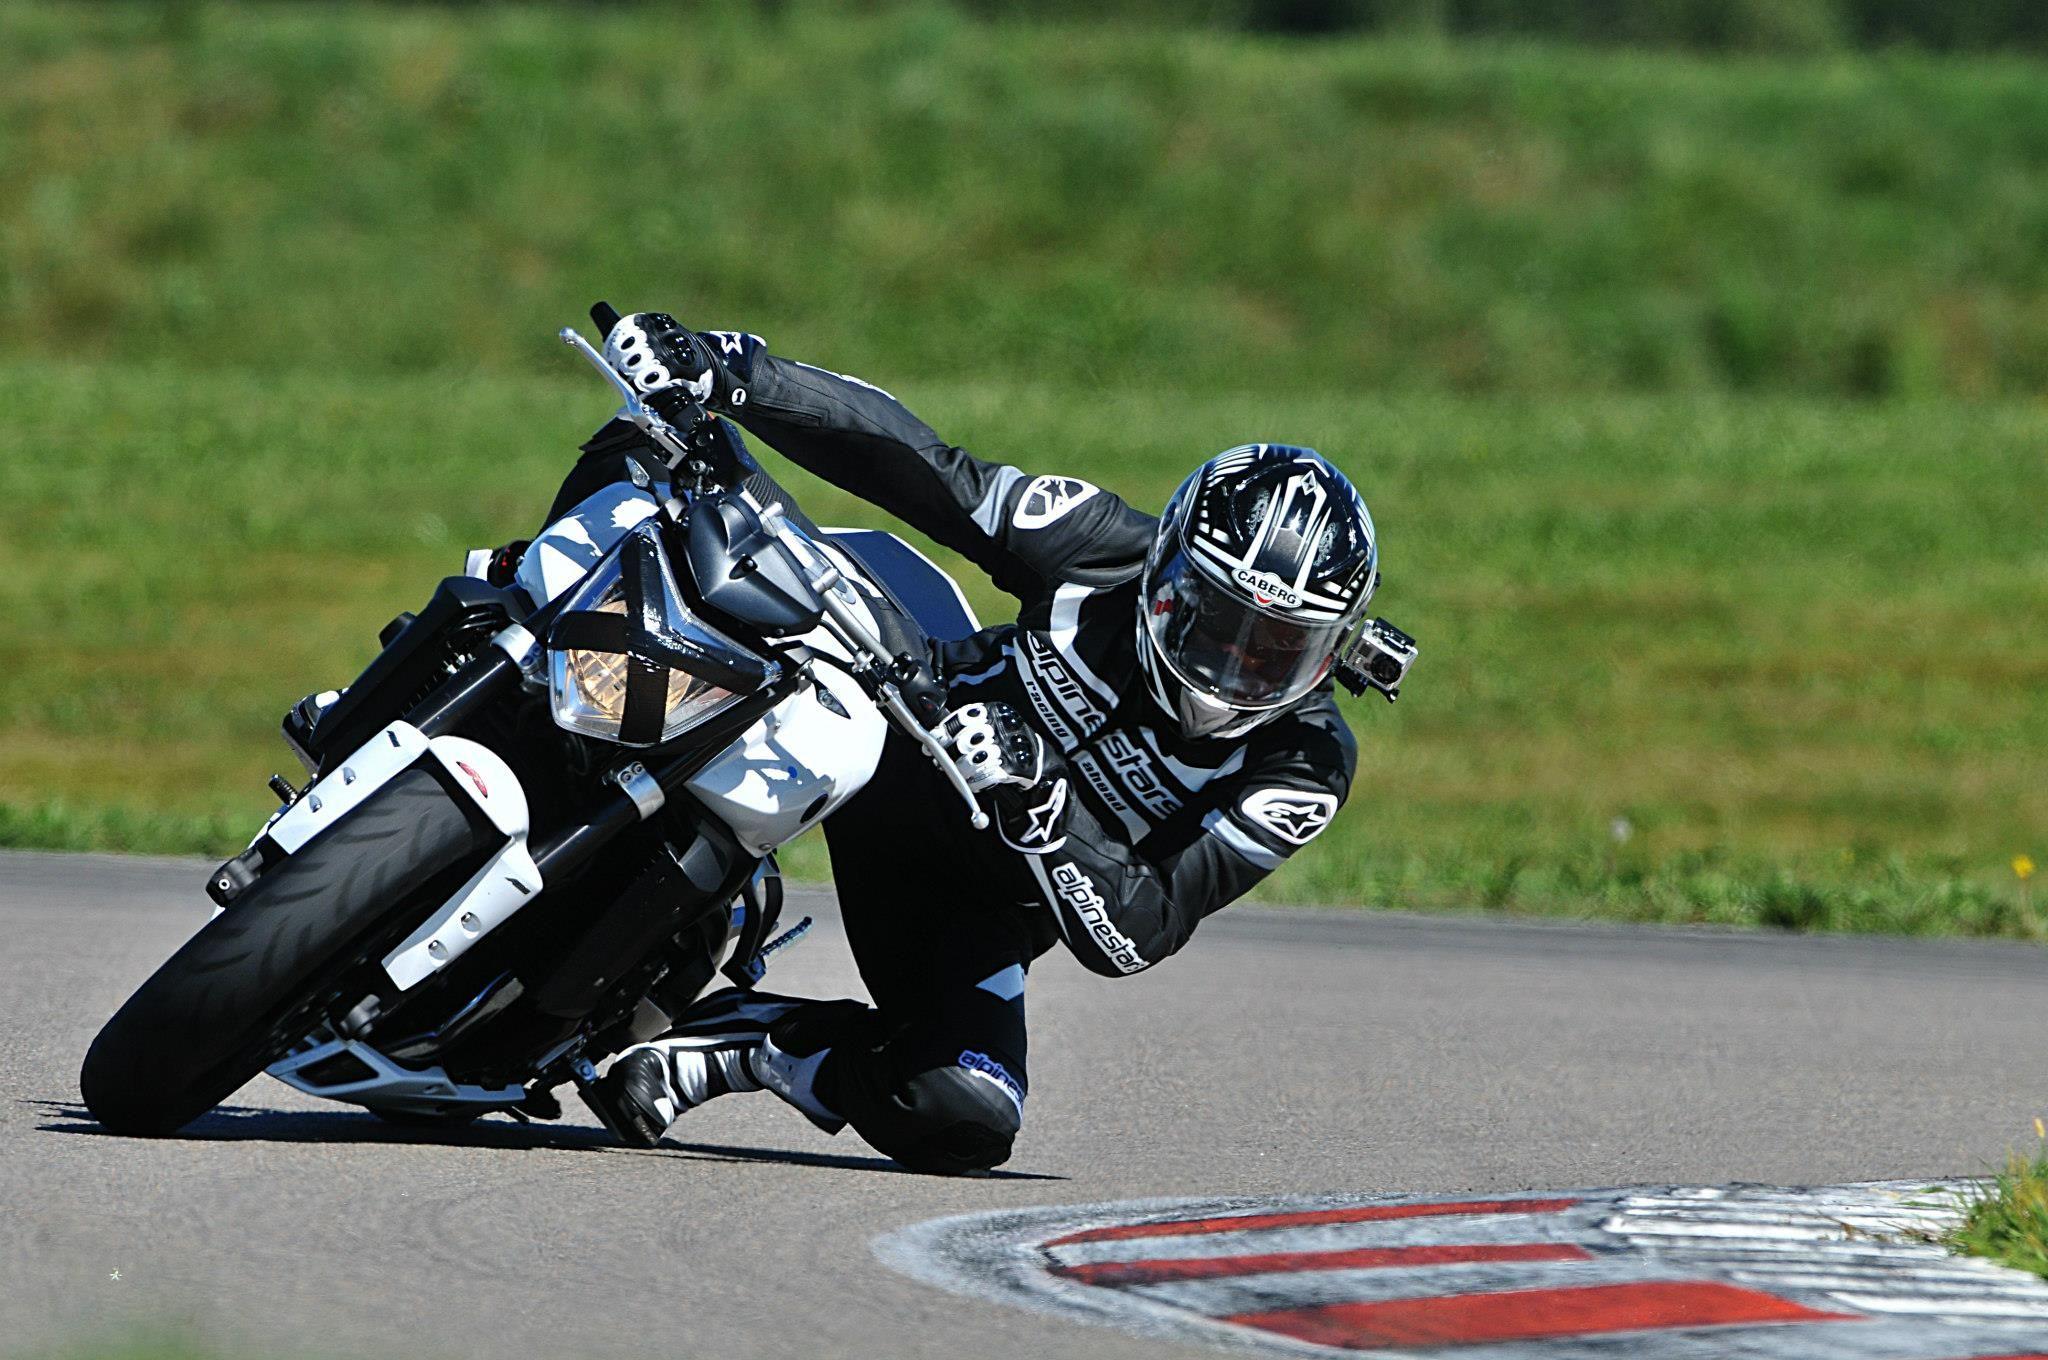 Bresse Race Track on Faya Yamaha Fz1 N ABS Alpinstars / Rizoma / Kellerman / Mivv Suono